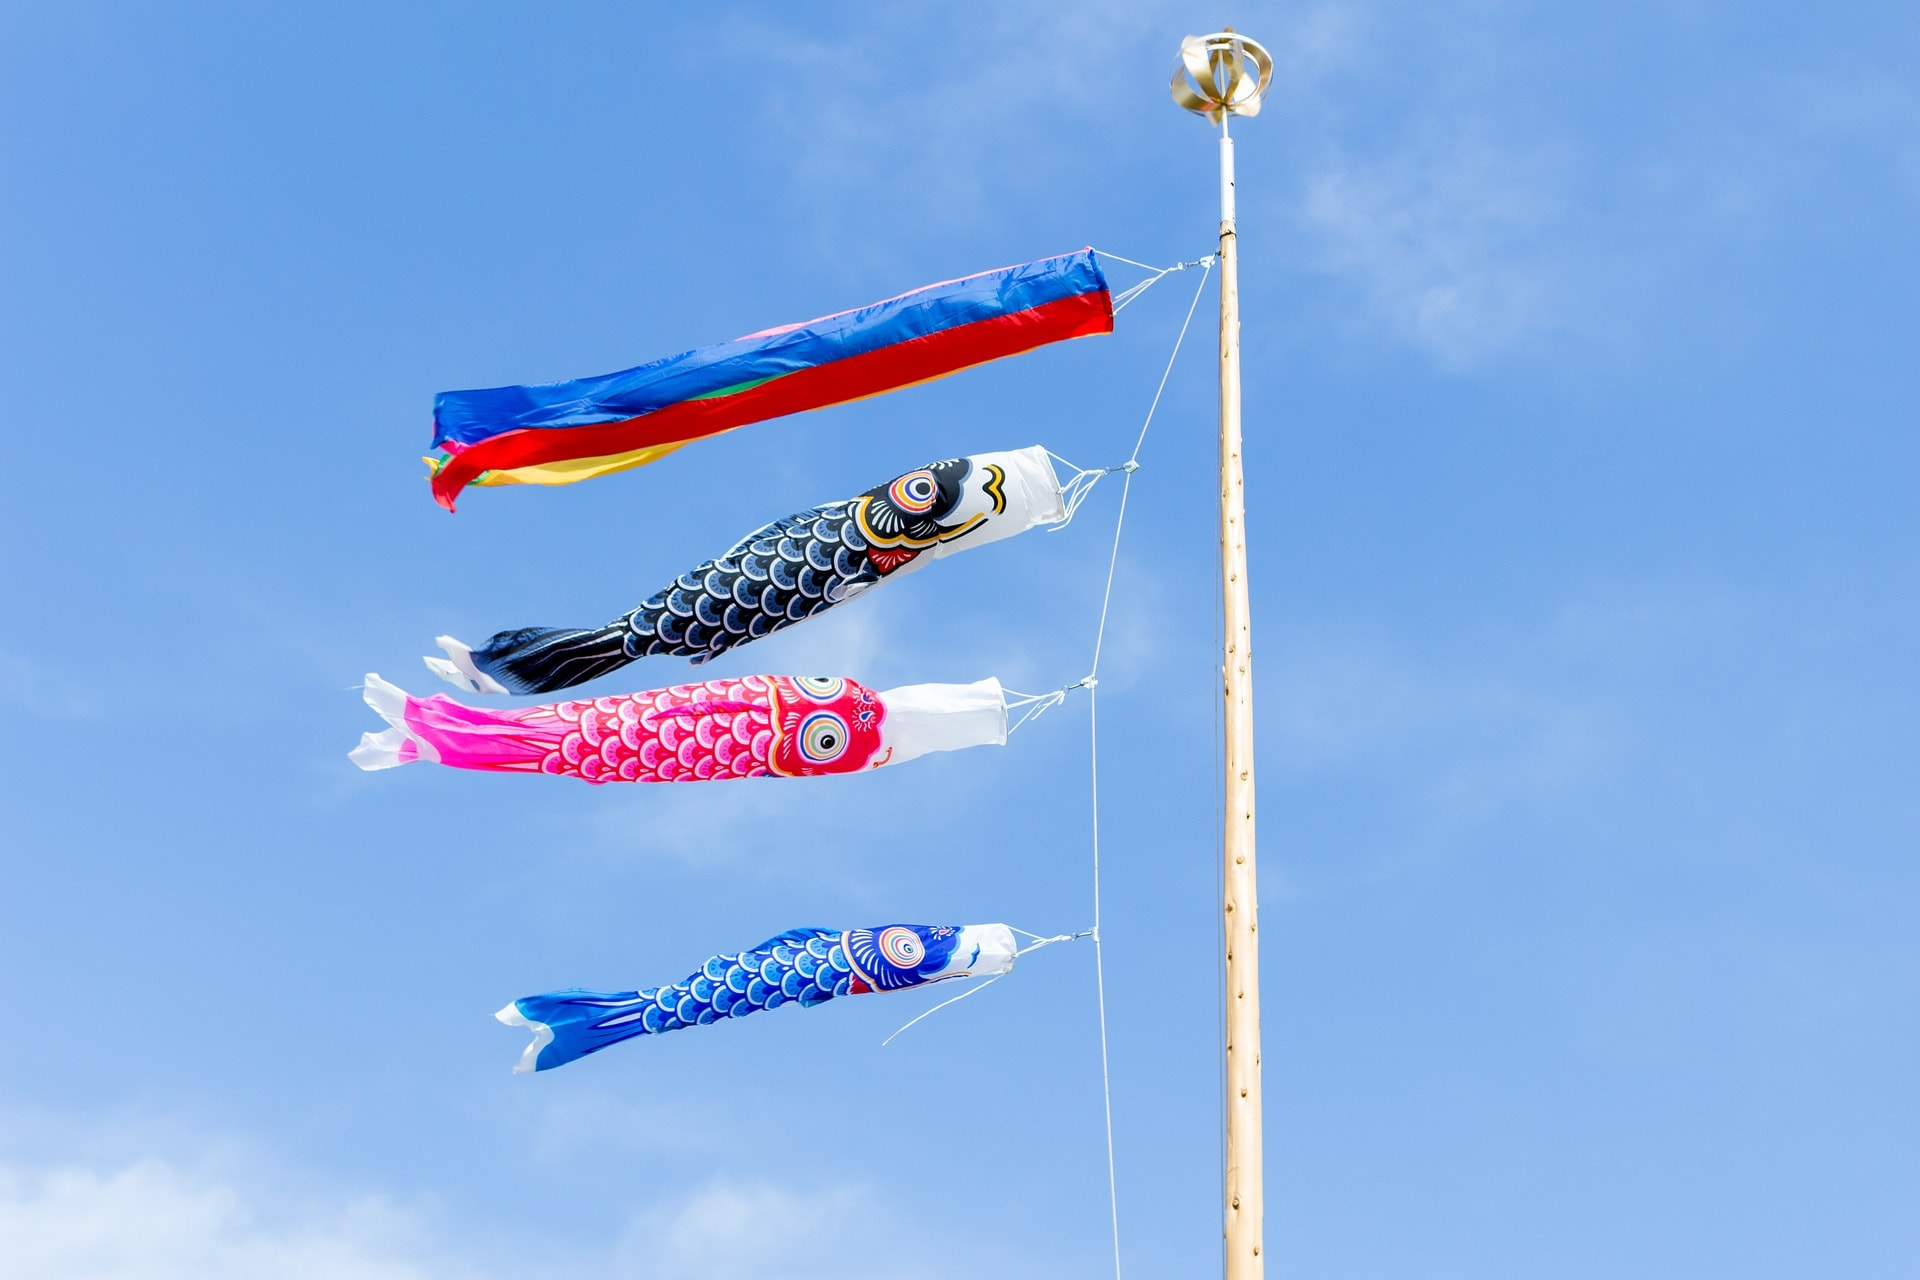 Children's day carp streamers